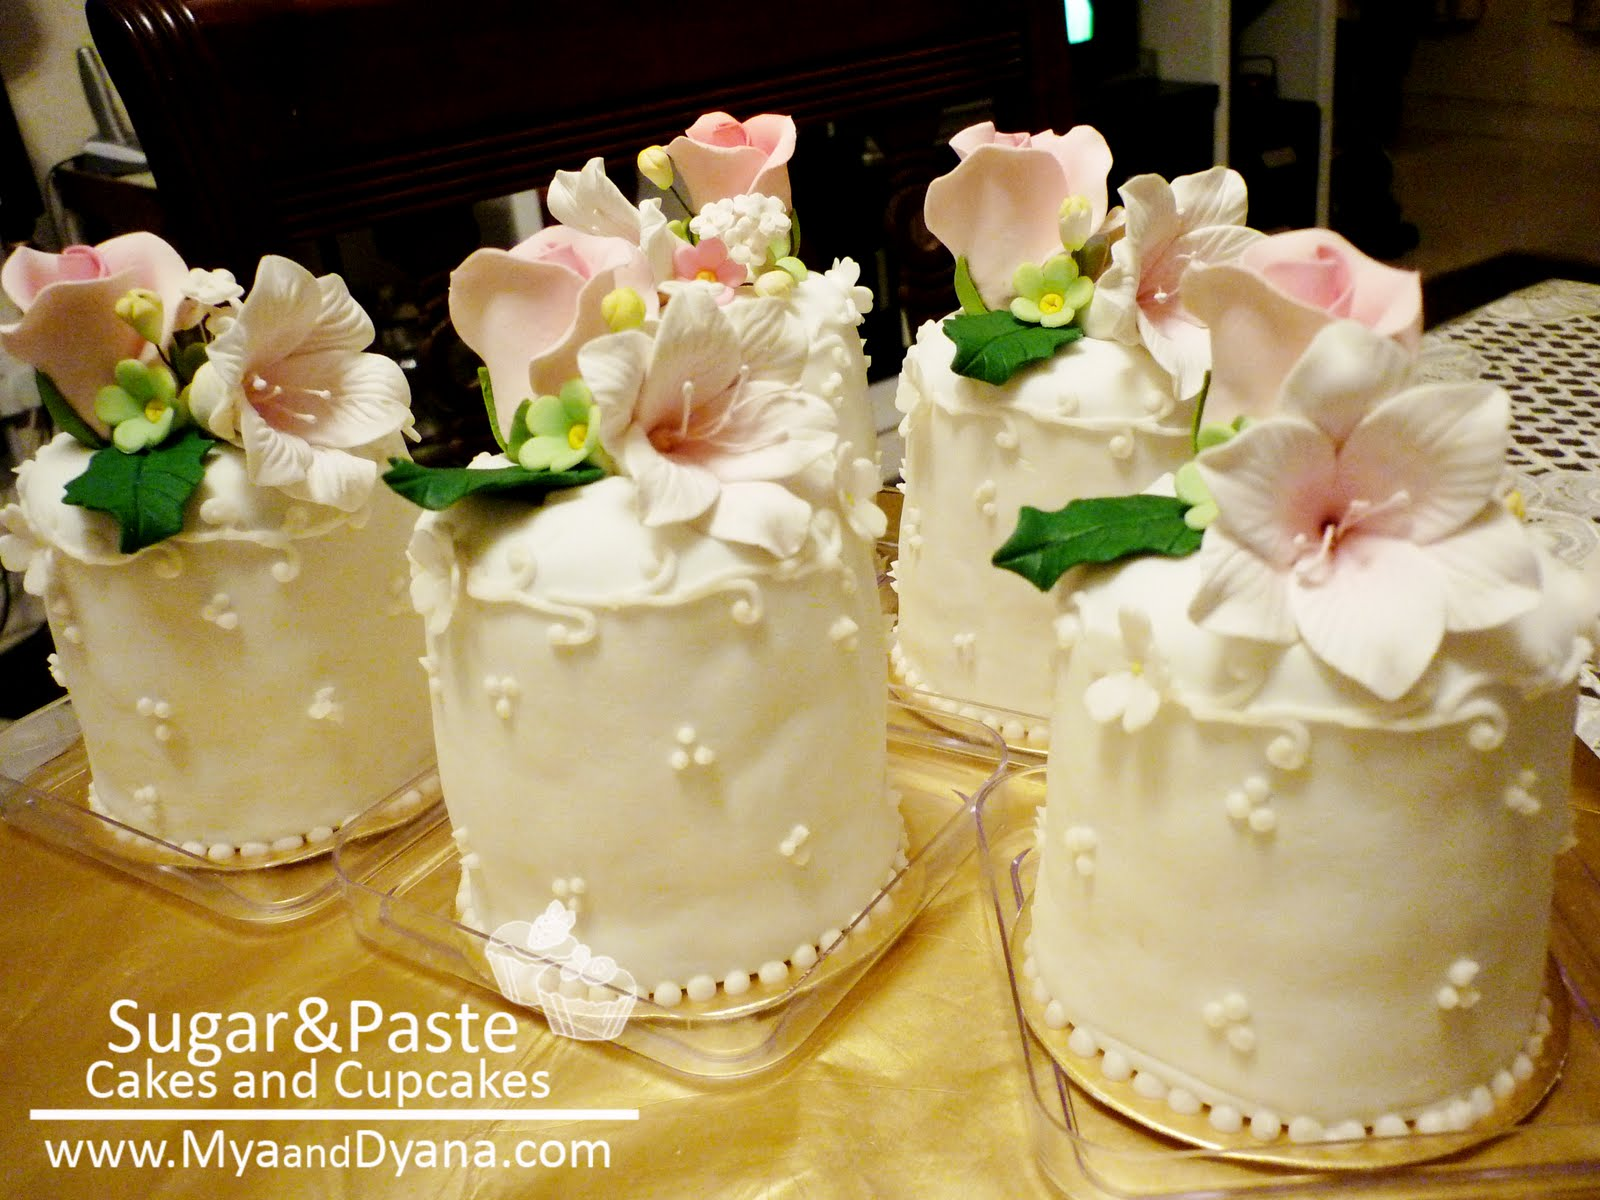 Sugar&Paste Cakes and Cupcakes: Mini Cake : Pink Fairies Version